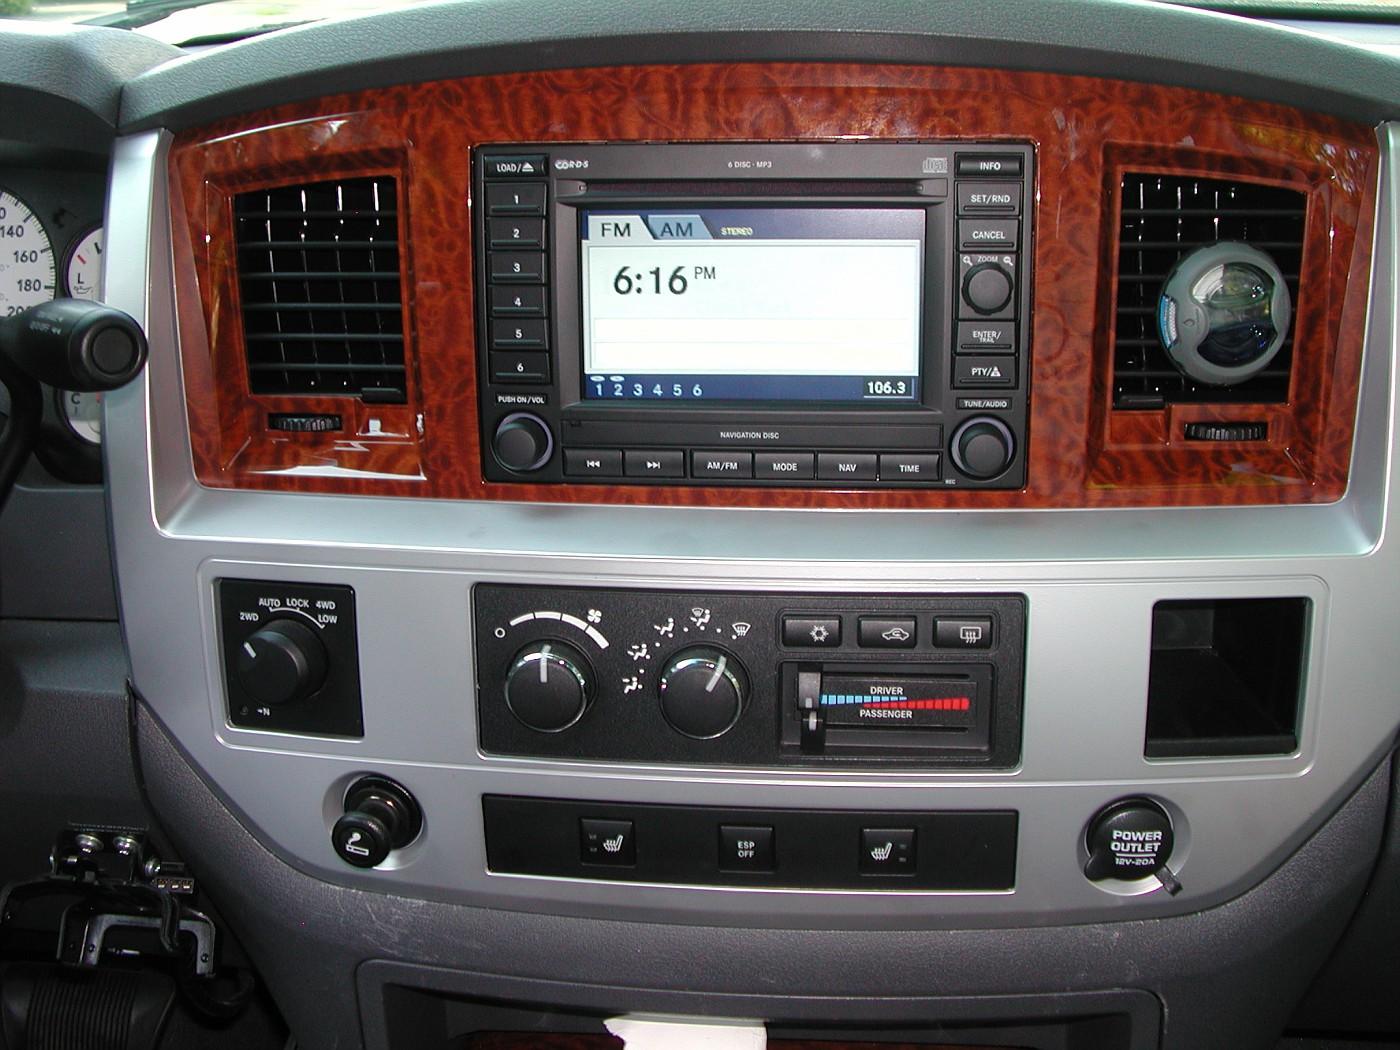 2007 Ram Navigation Radio Rec Installation Pic S Dodgeforum Com